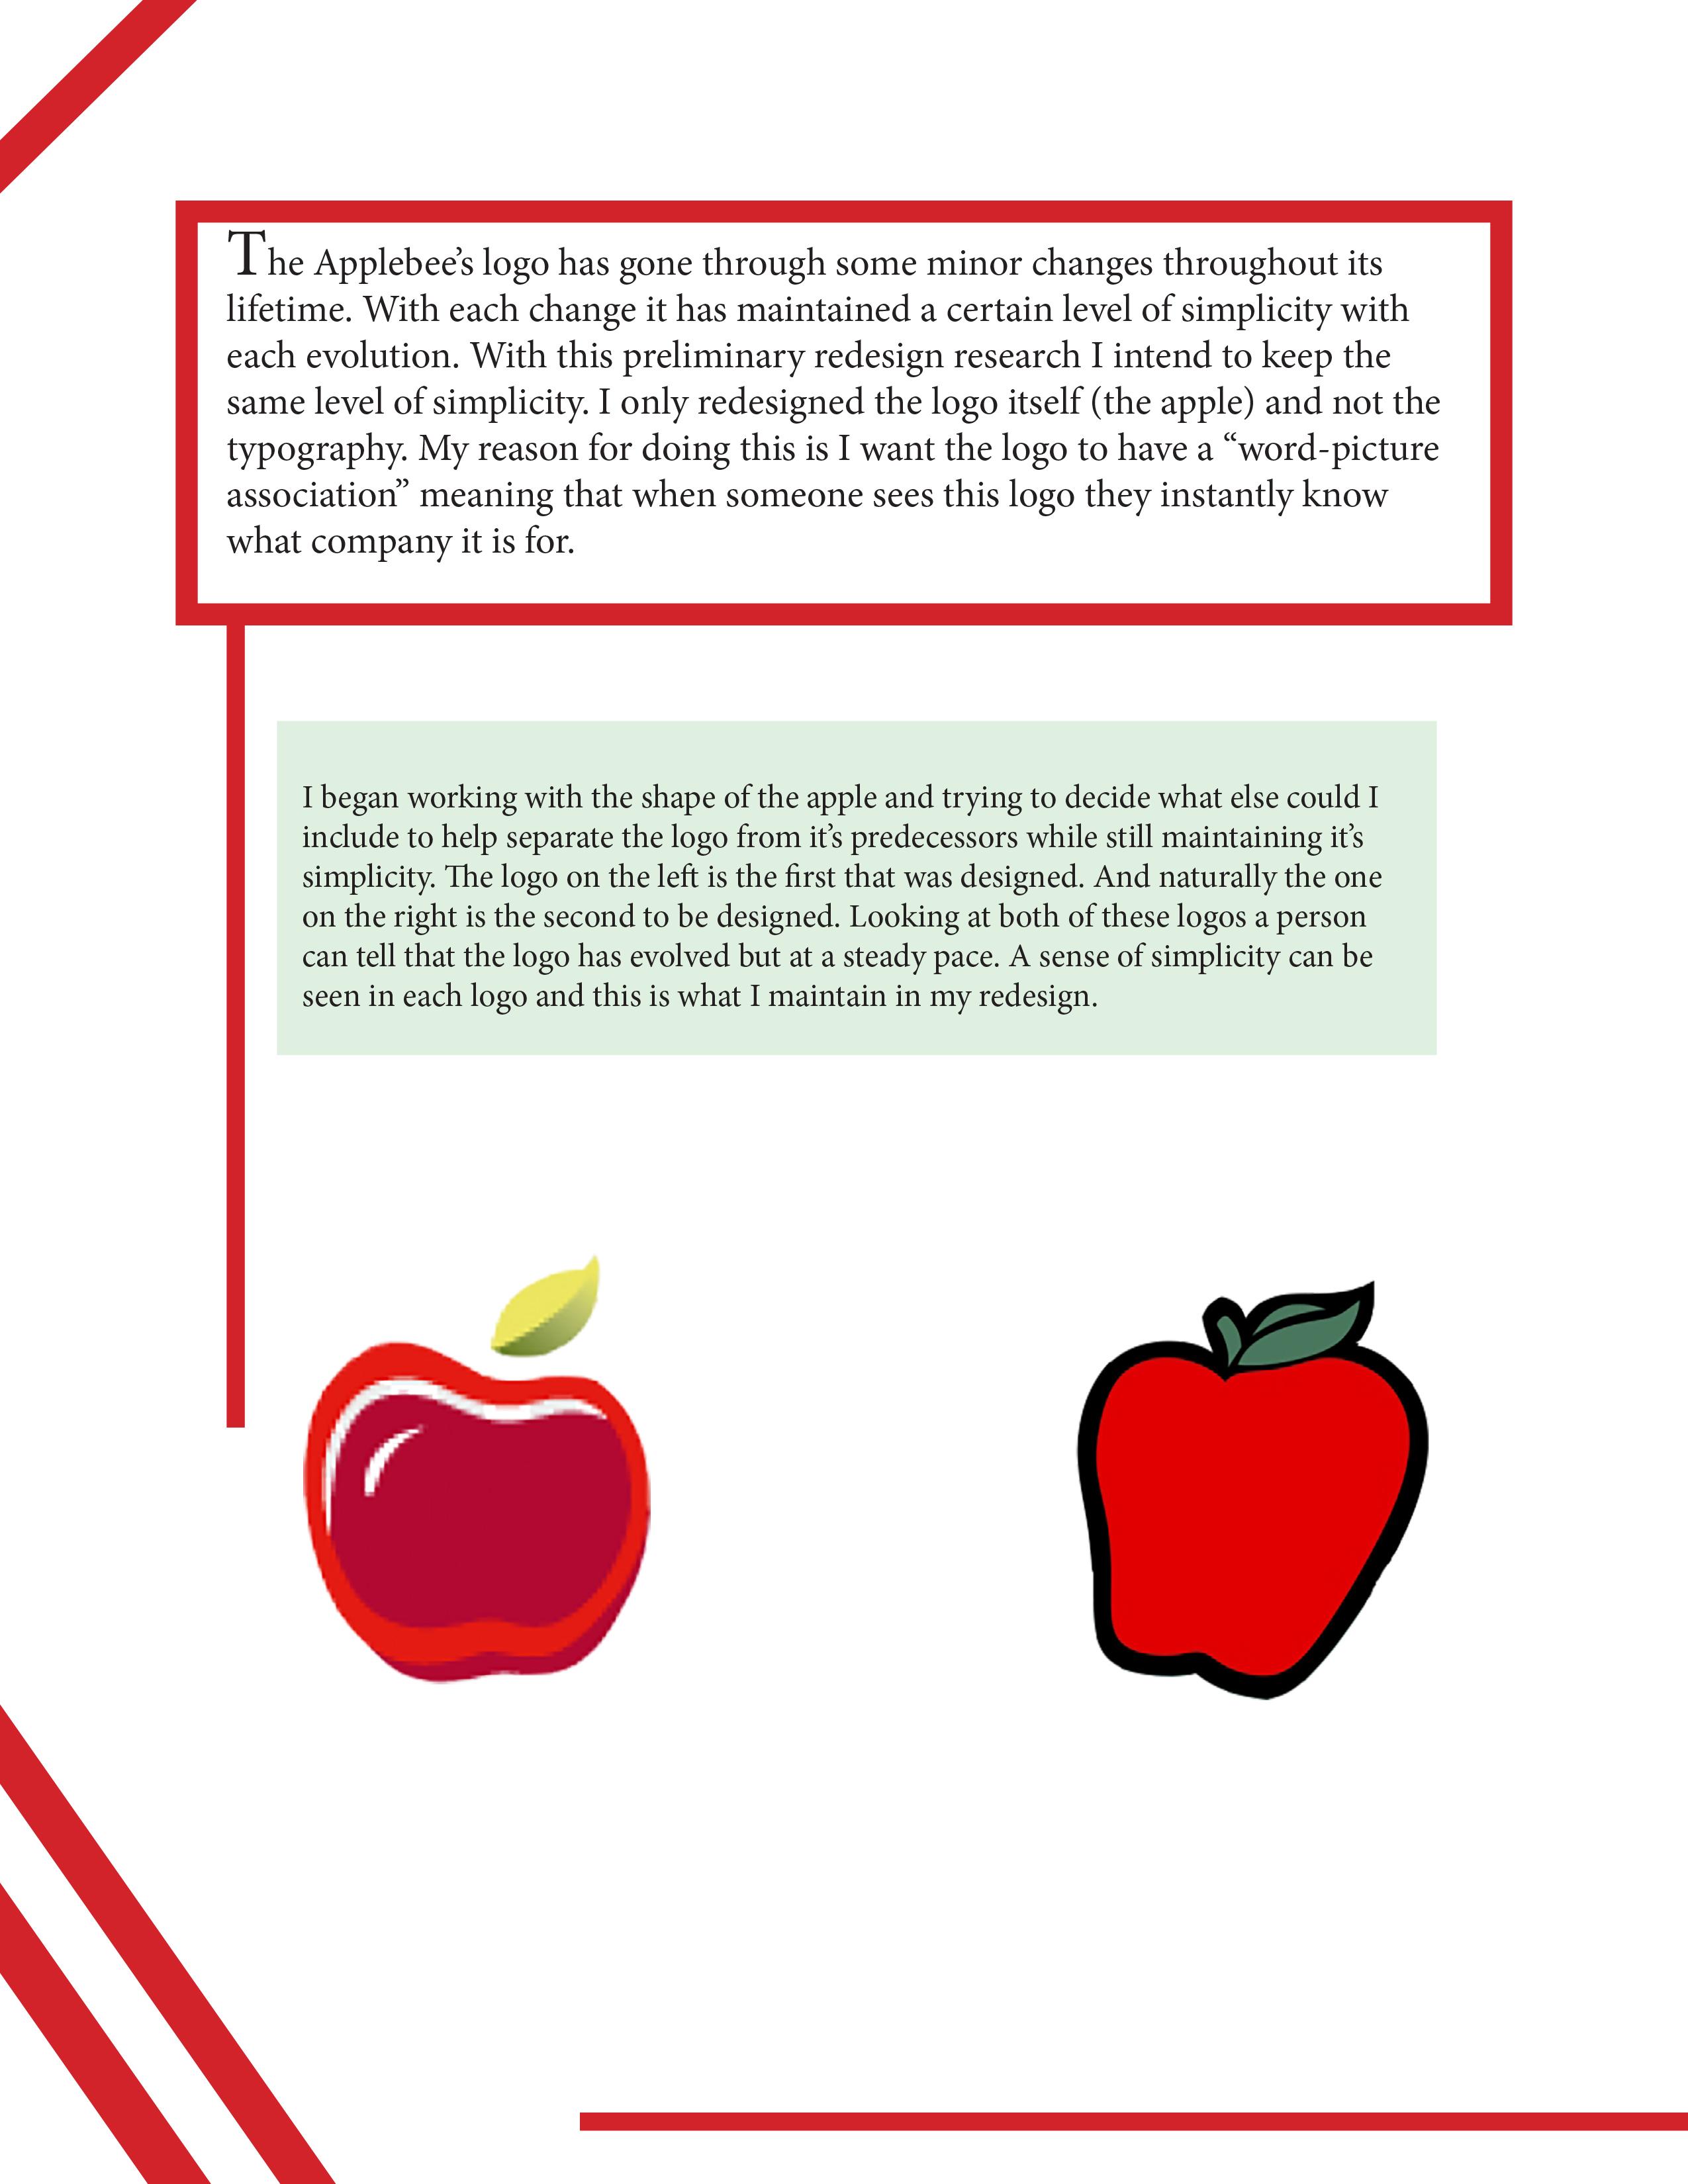 Applbee's Redesign Document Print-2